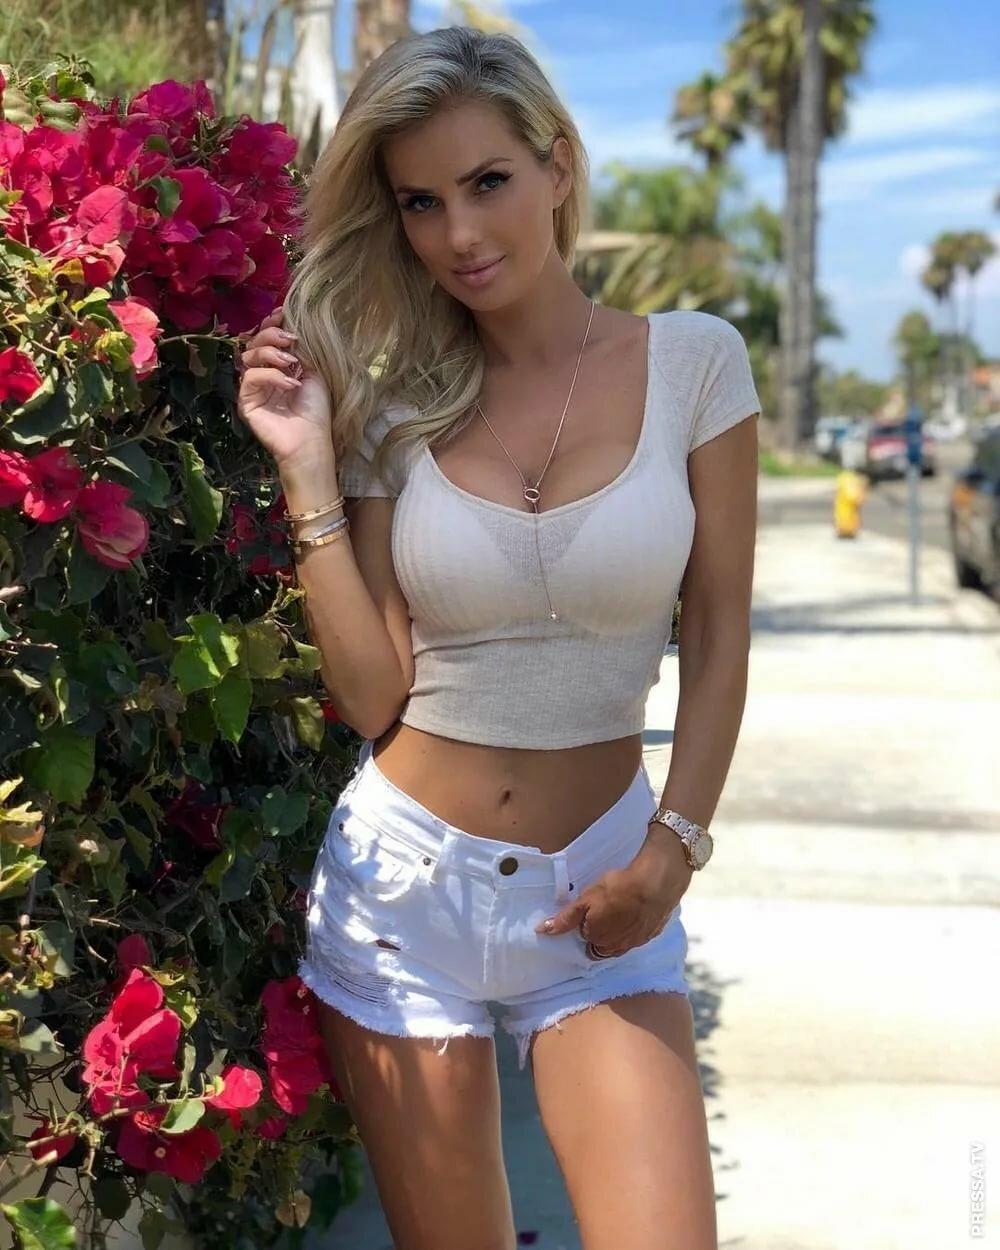 Short petite blonde fucked — photo 8